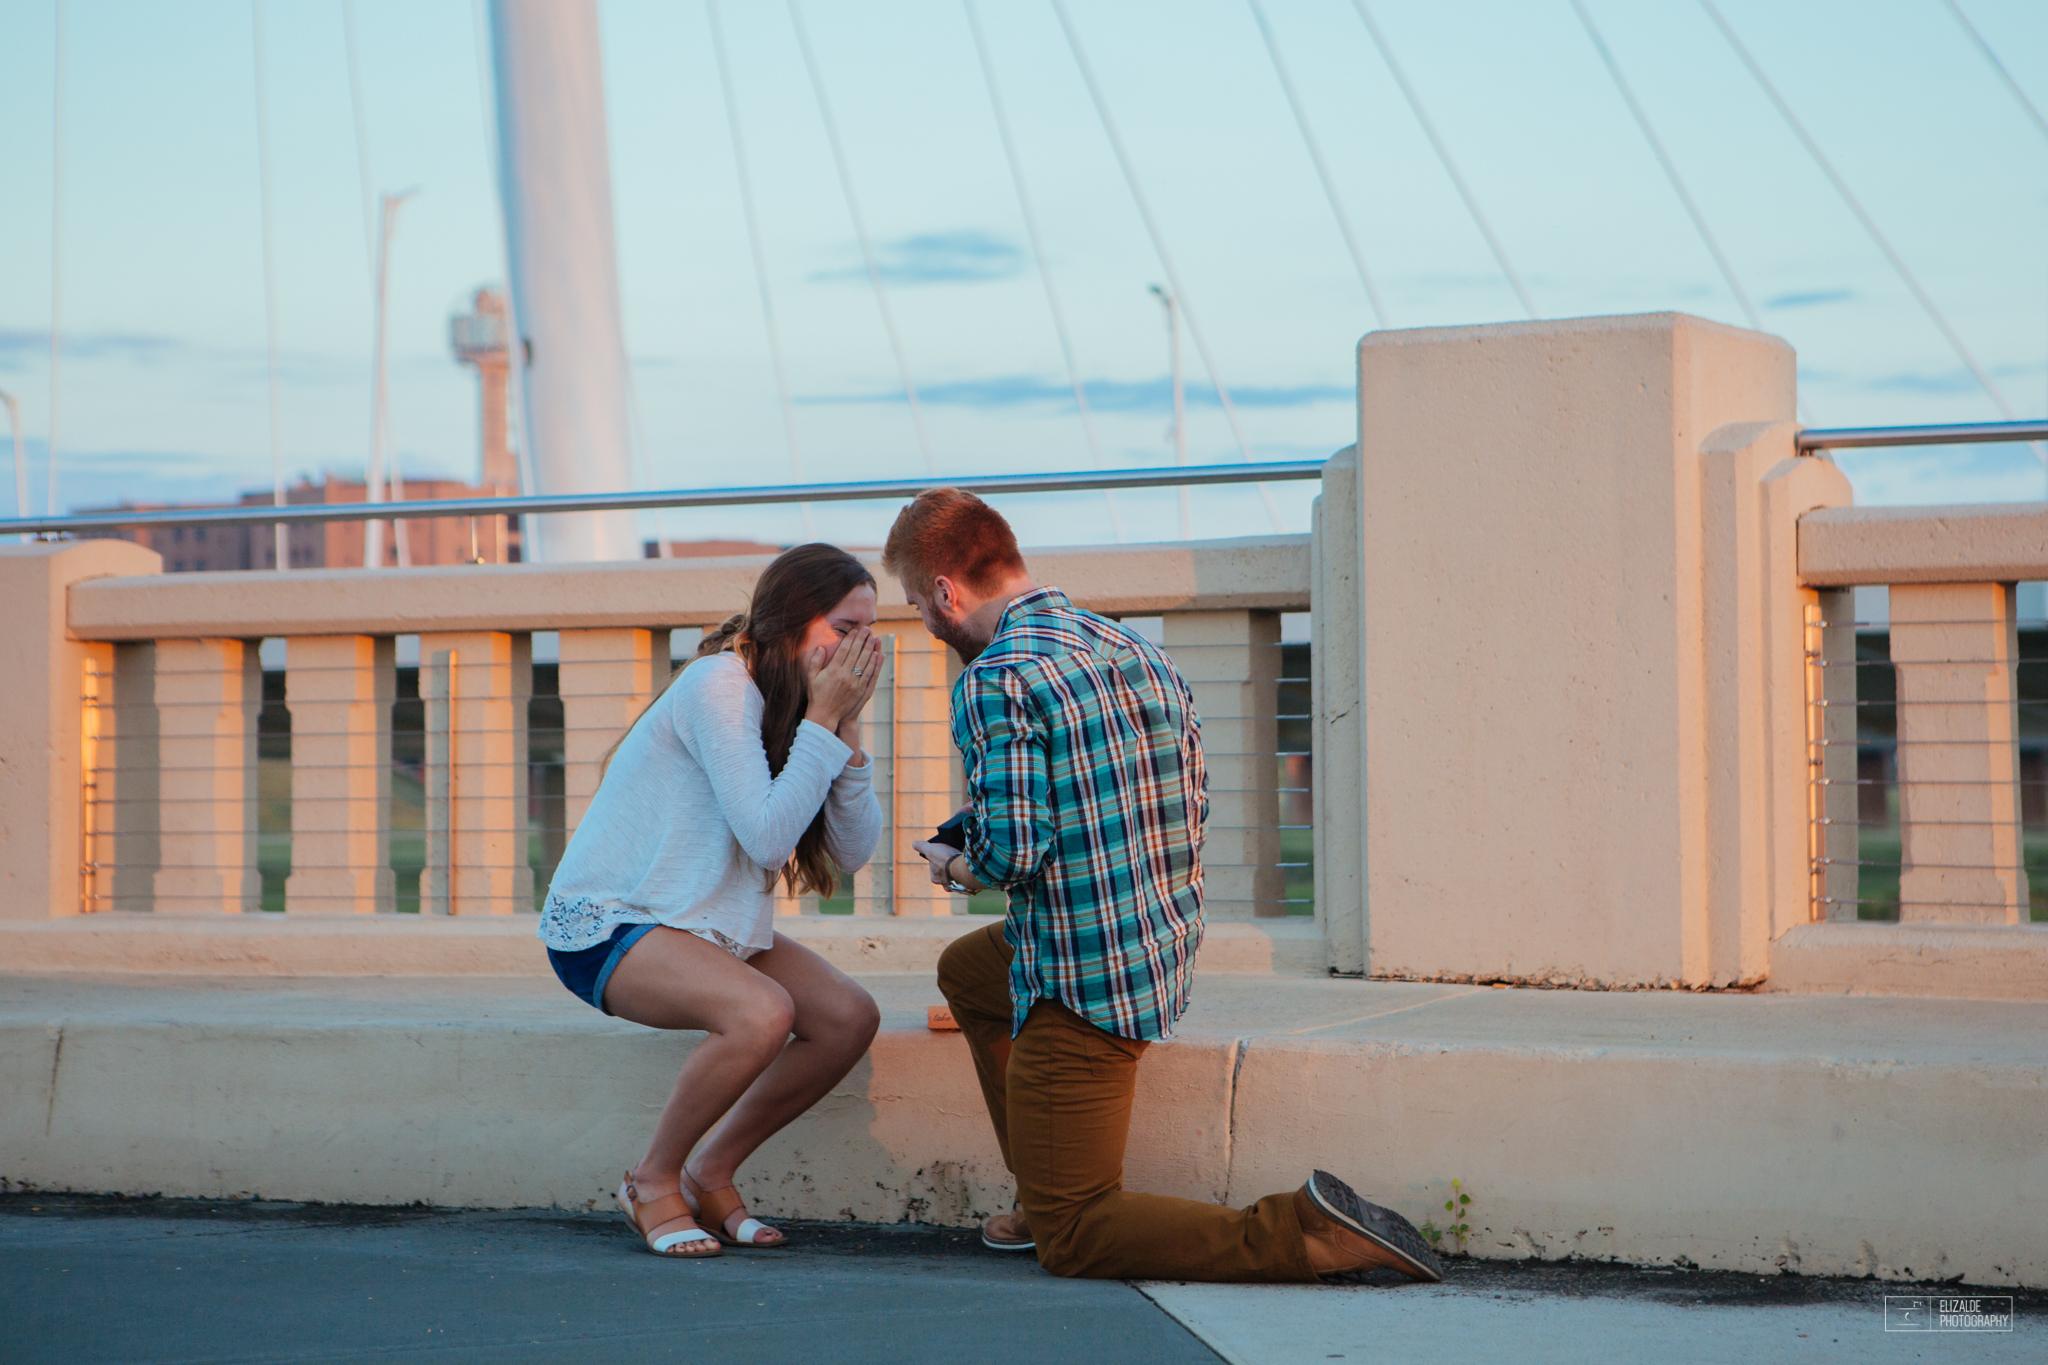 Proposal_DFW Wedding Photographer_Dallas Photographer_Elizalde Photography_margaret hunt hill bridge (5 of 21).jpg